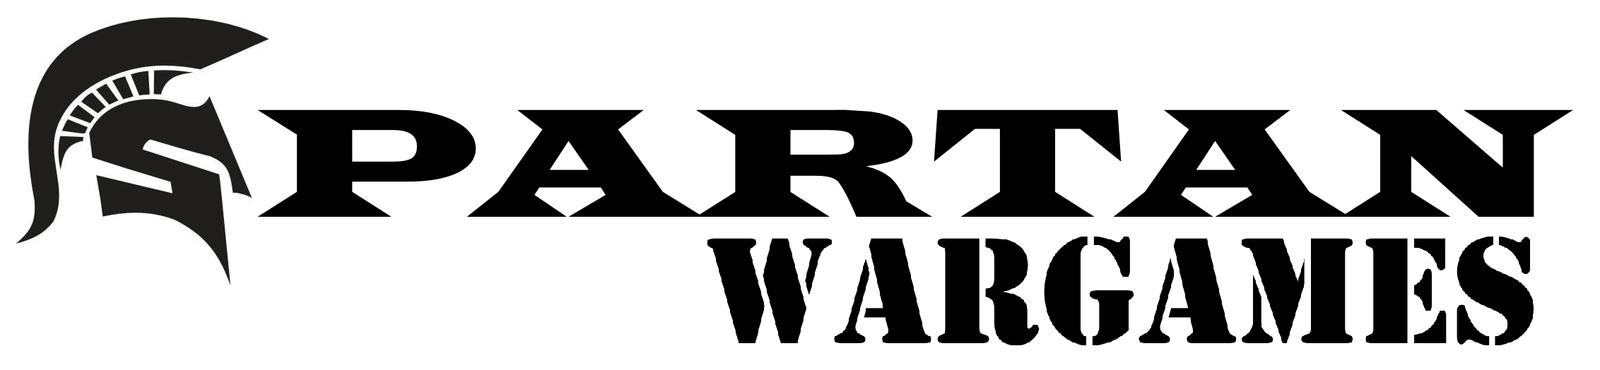 SPARTAN WARGAMES